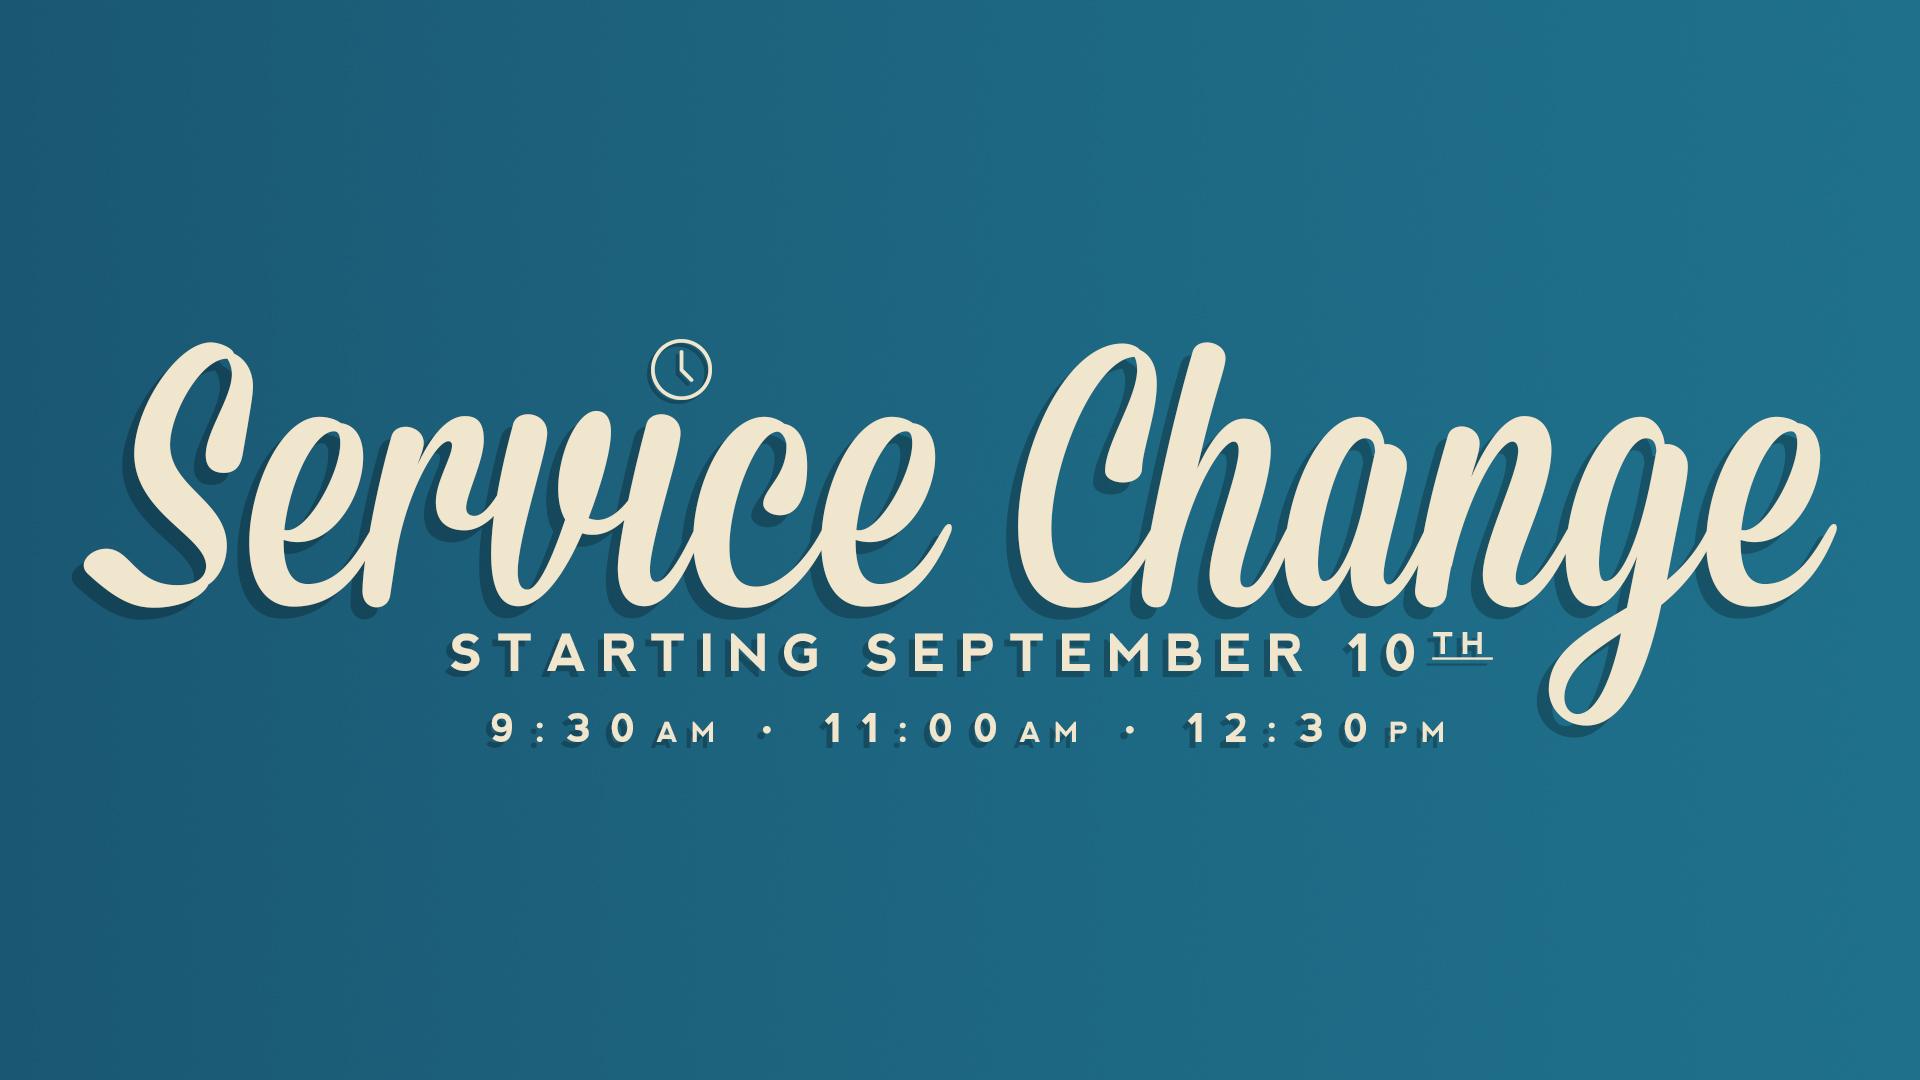 service-change.jpg